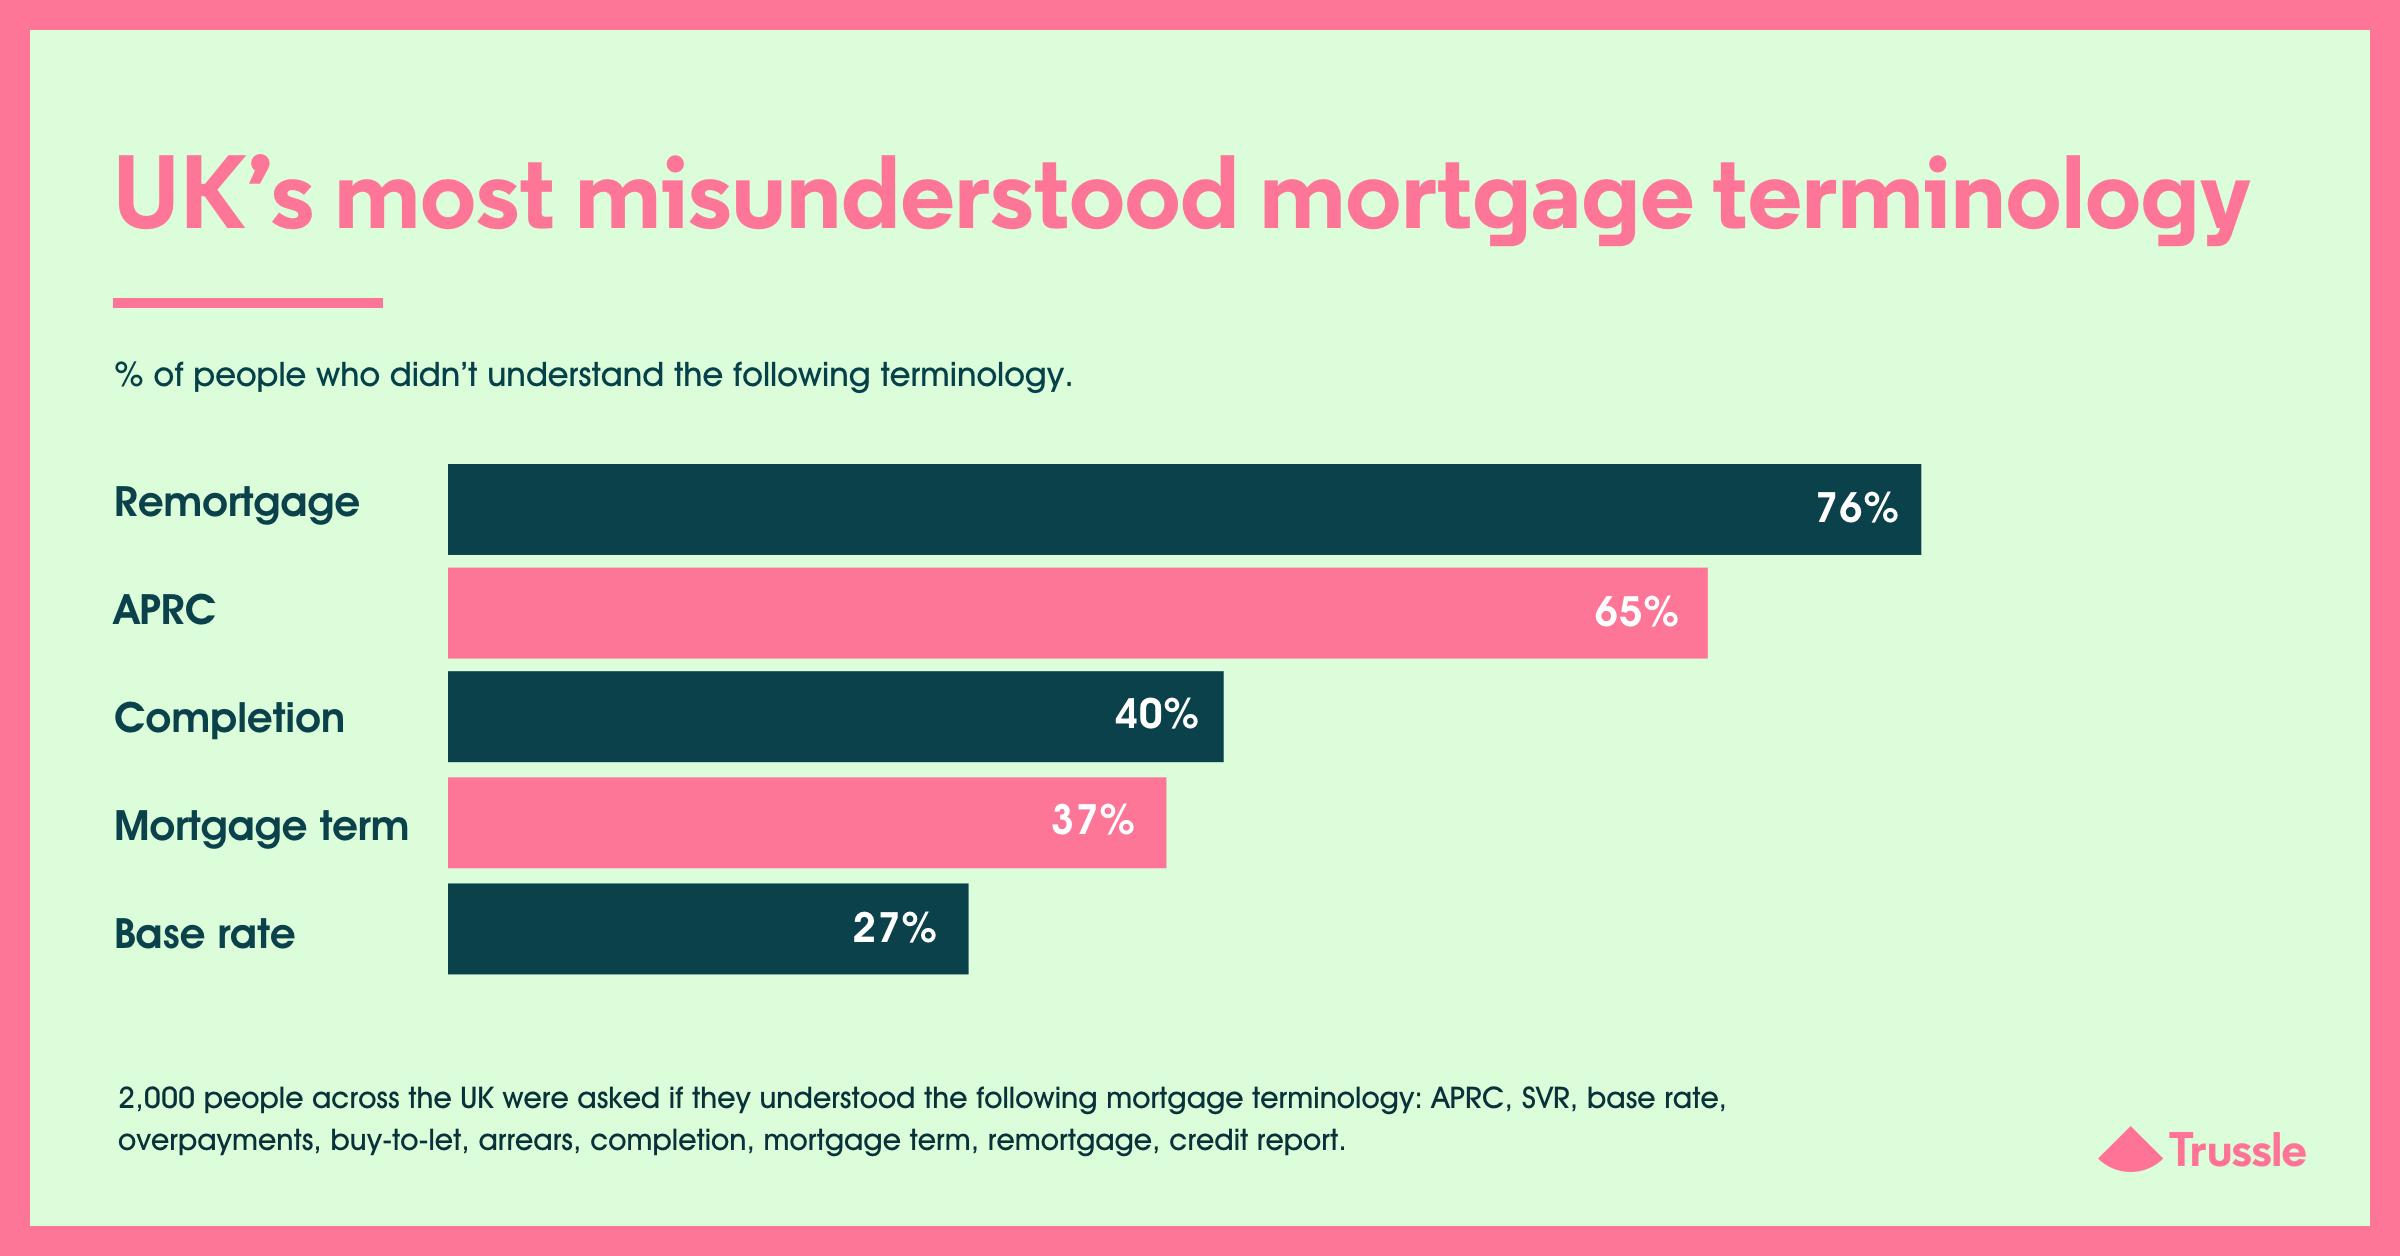 mortgage misunserstood terminology